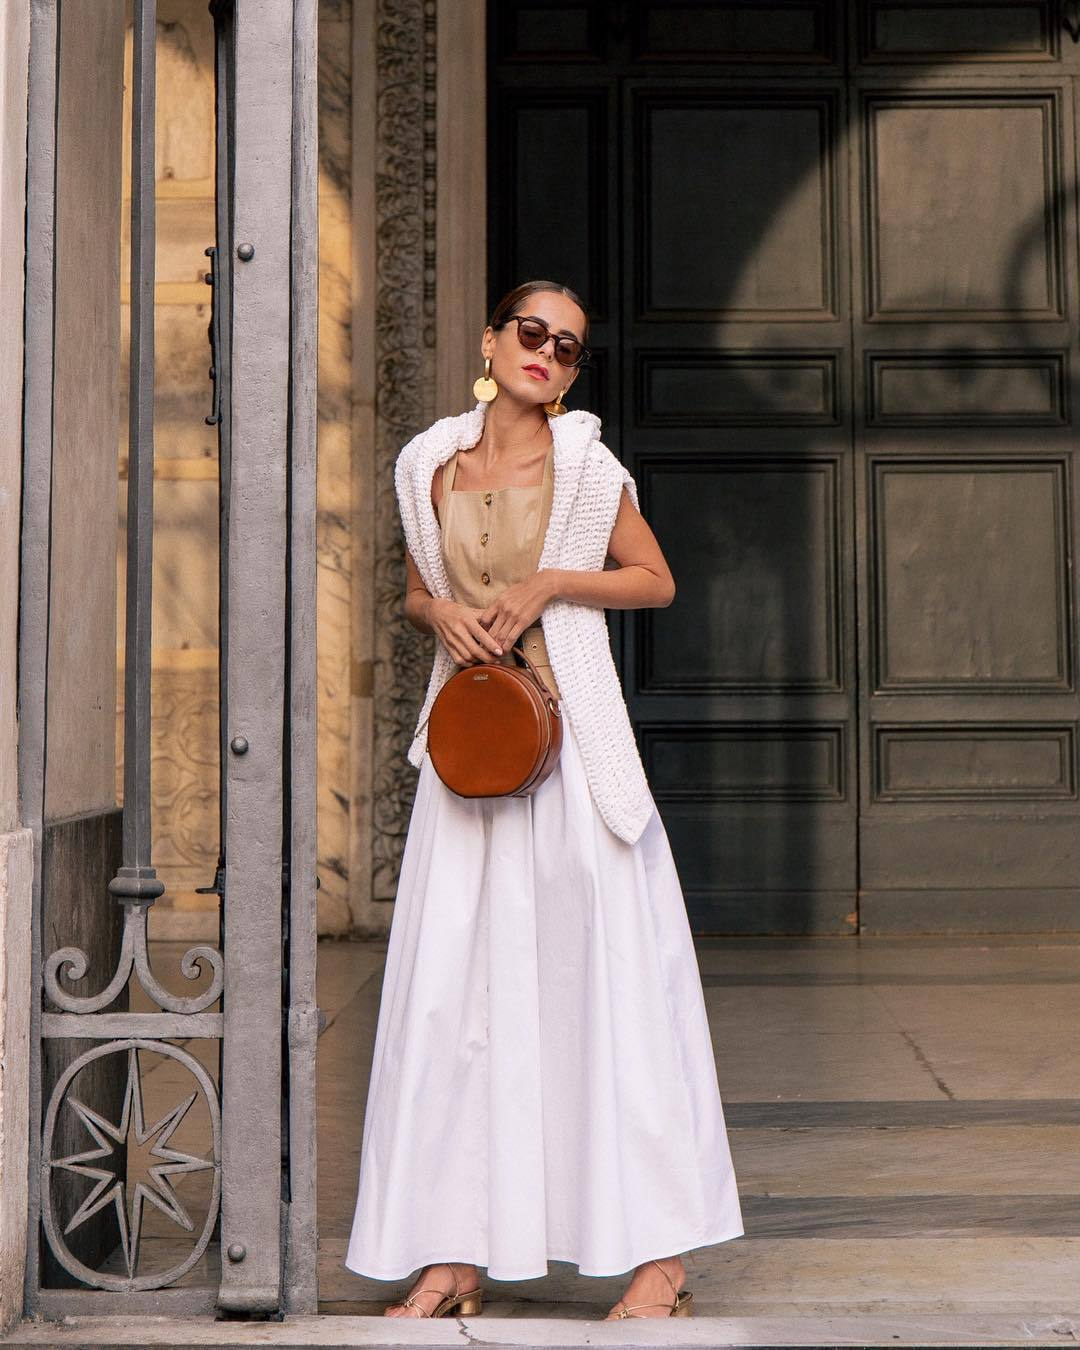 skirt white skirt maxi skirt sandals brown bag white cardigan tank top dress maxi dress belted dress